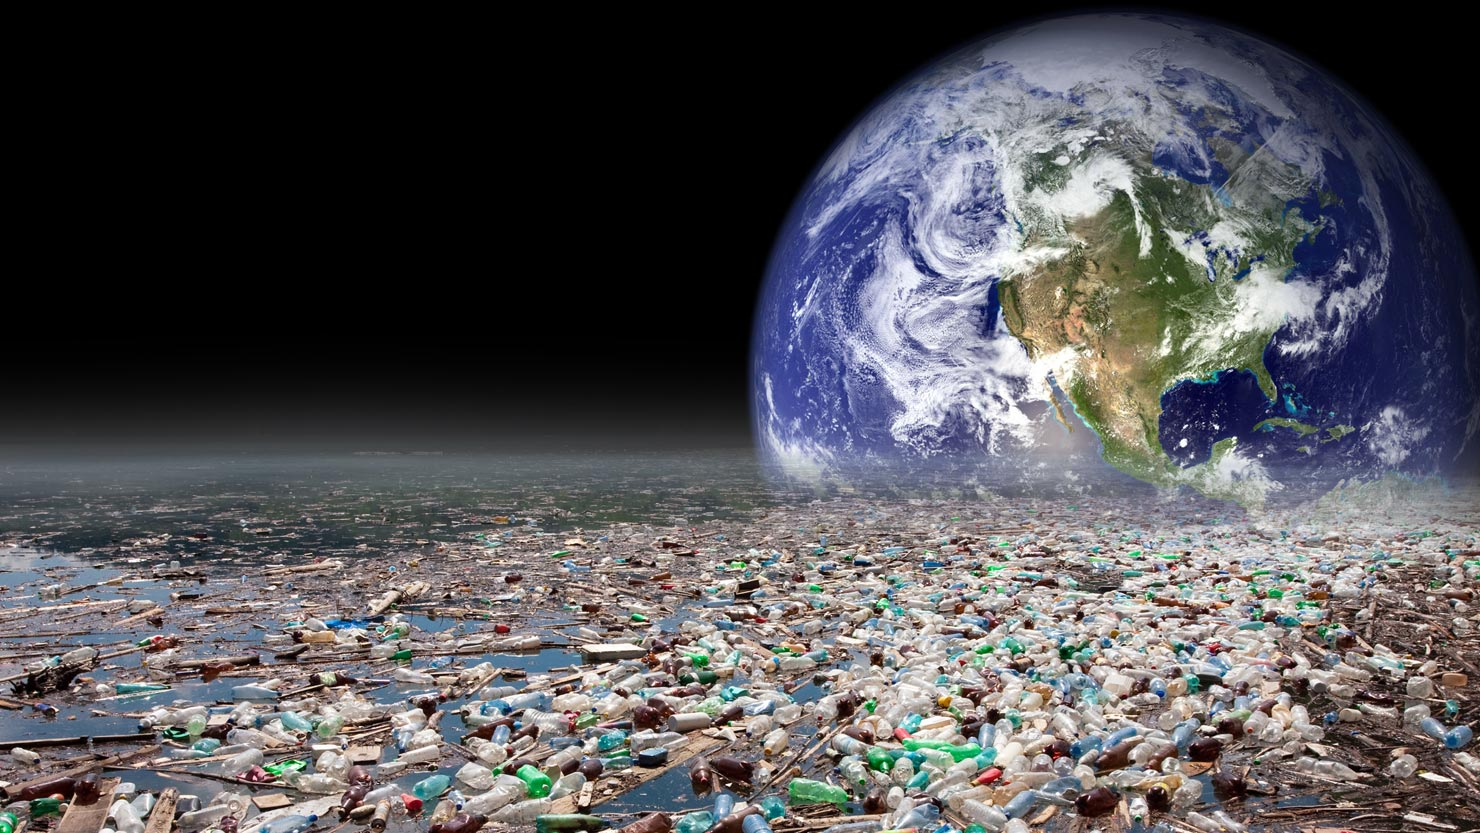 earthrise-over-plastic